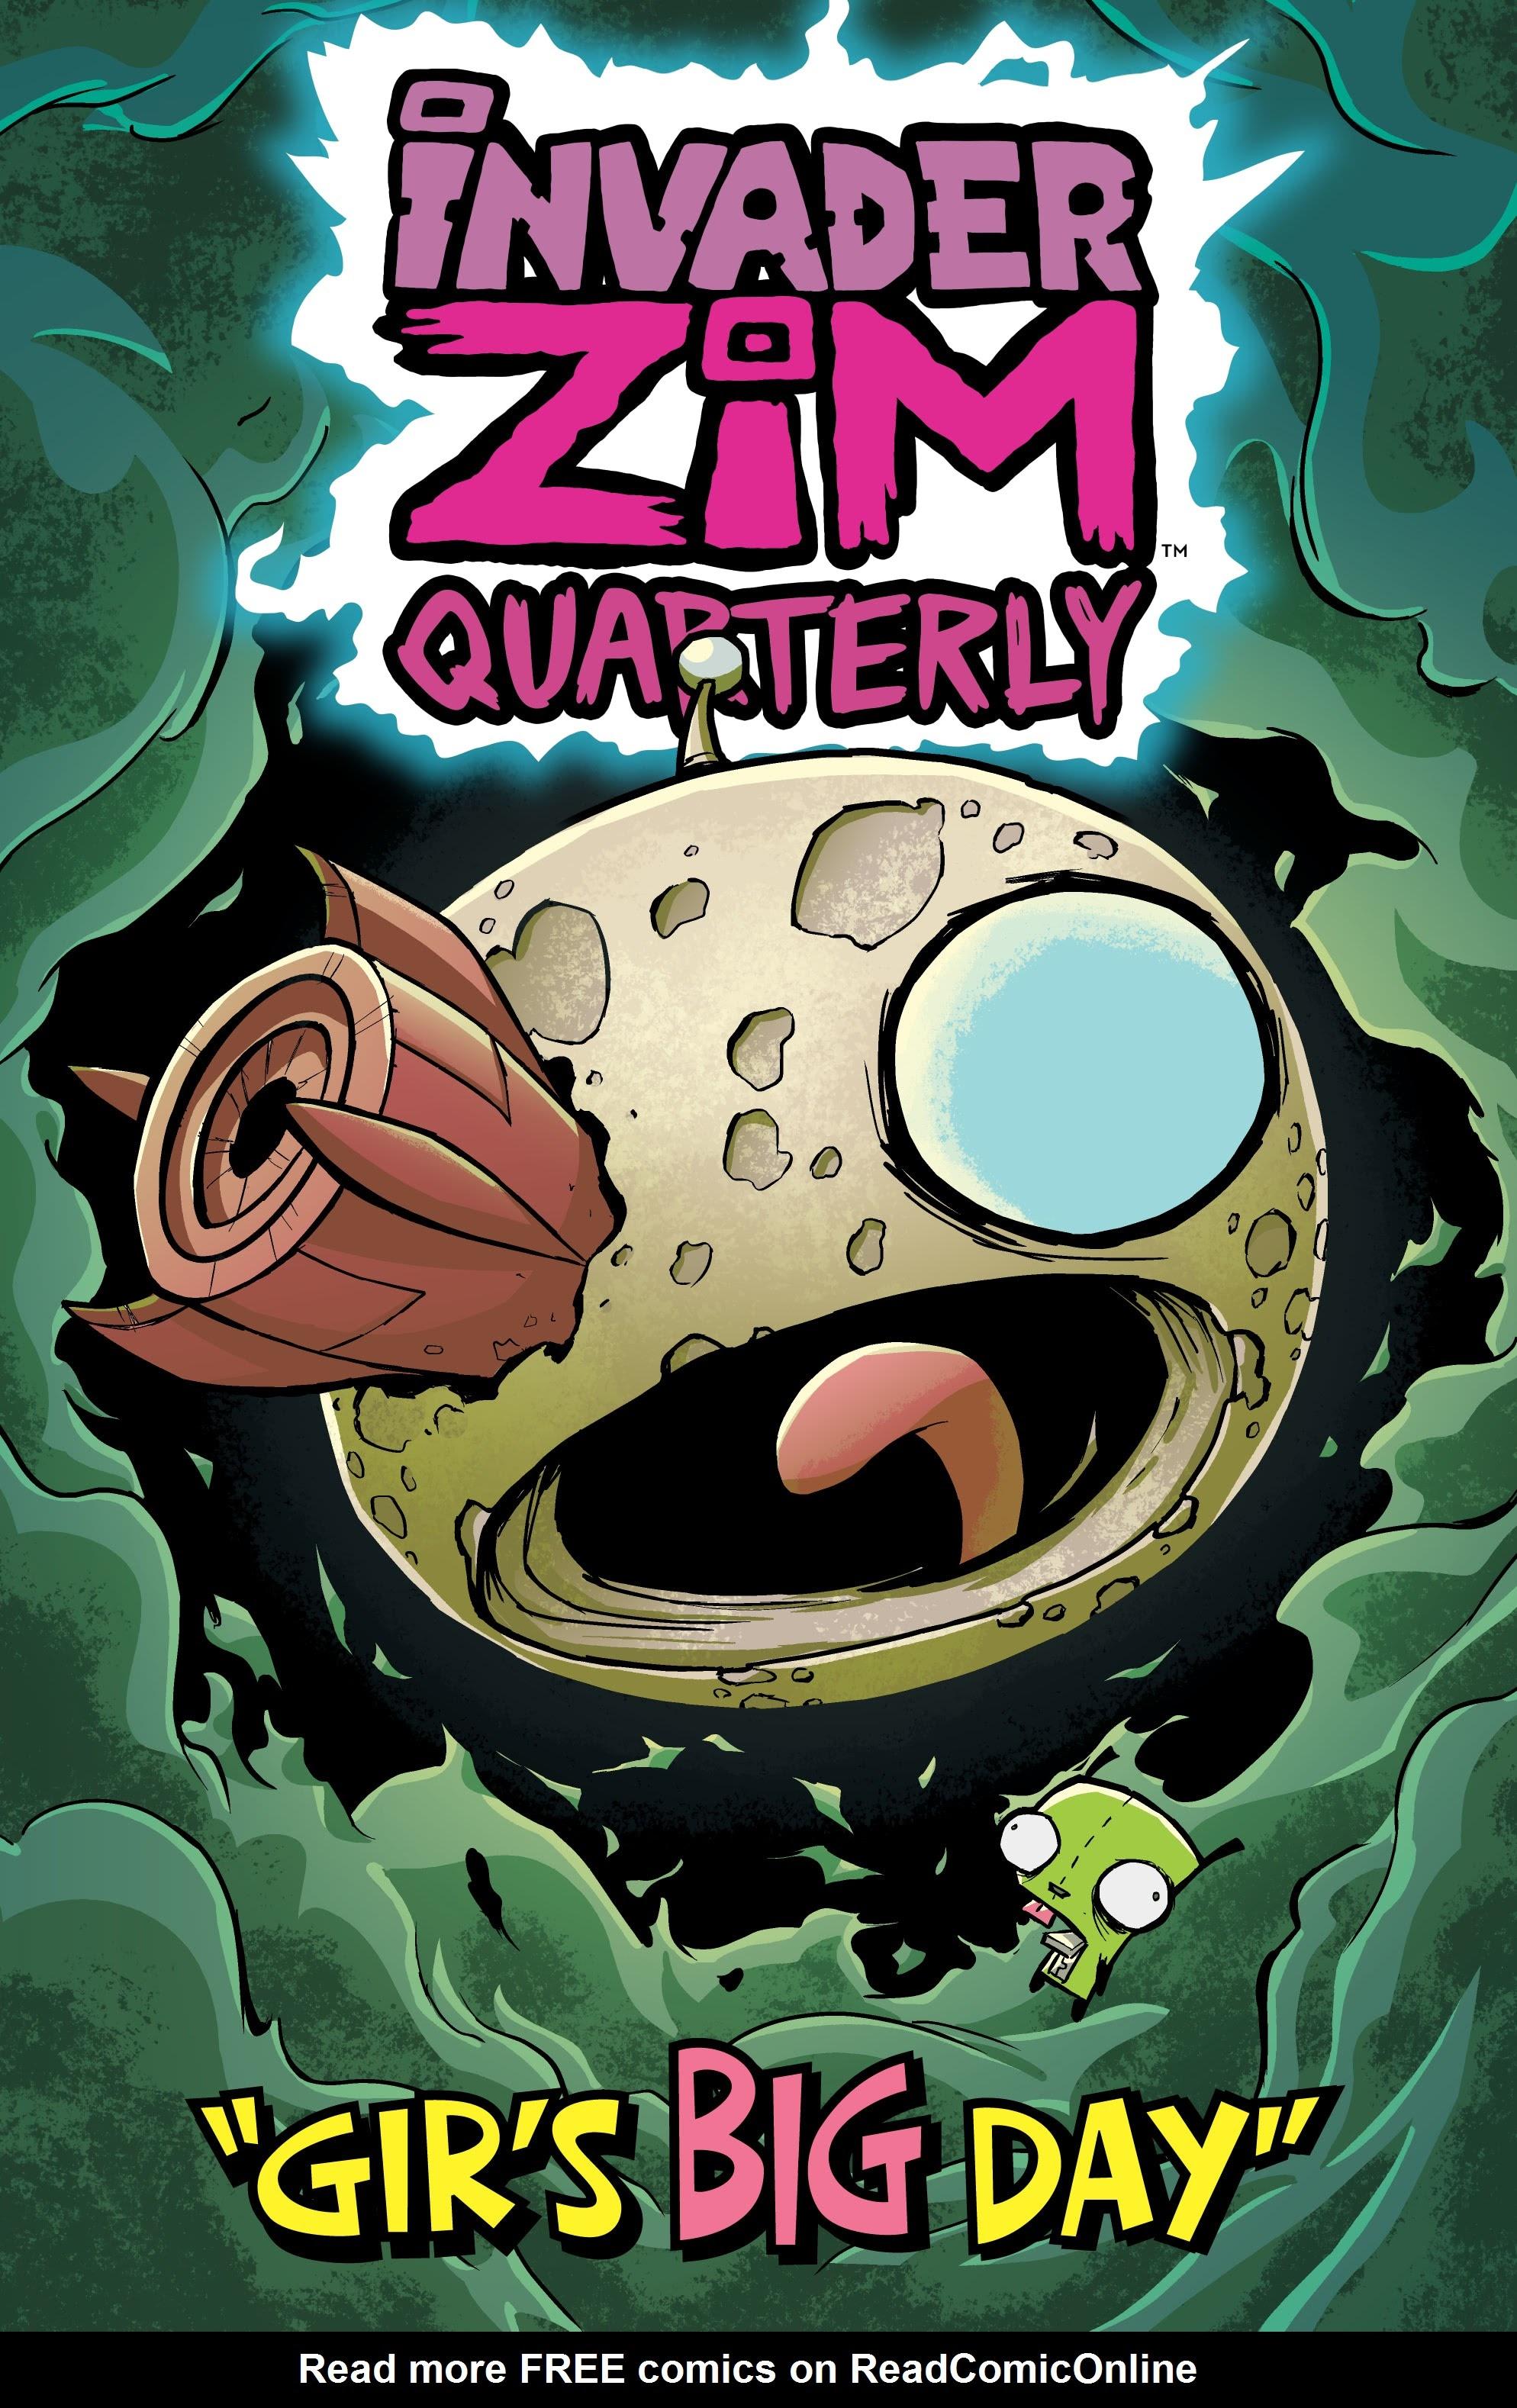 Invader Zim Quarterly: Girs Big Day Full Page 1